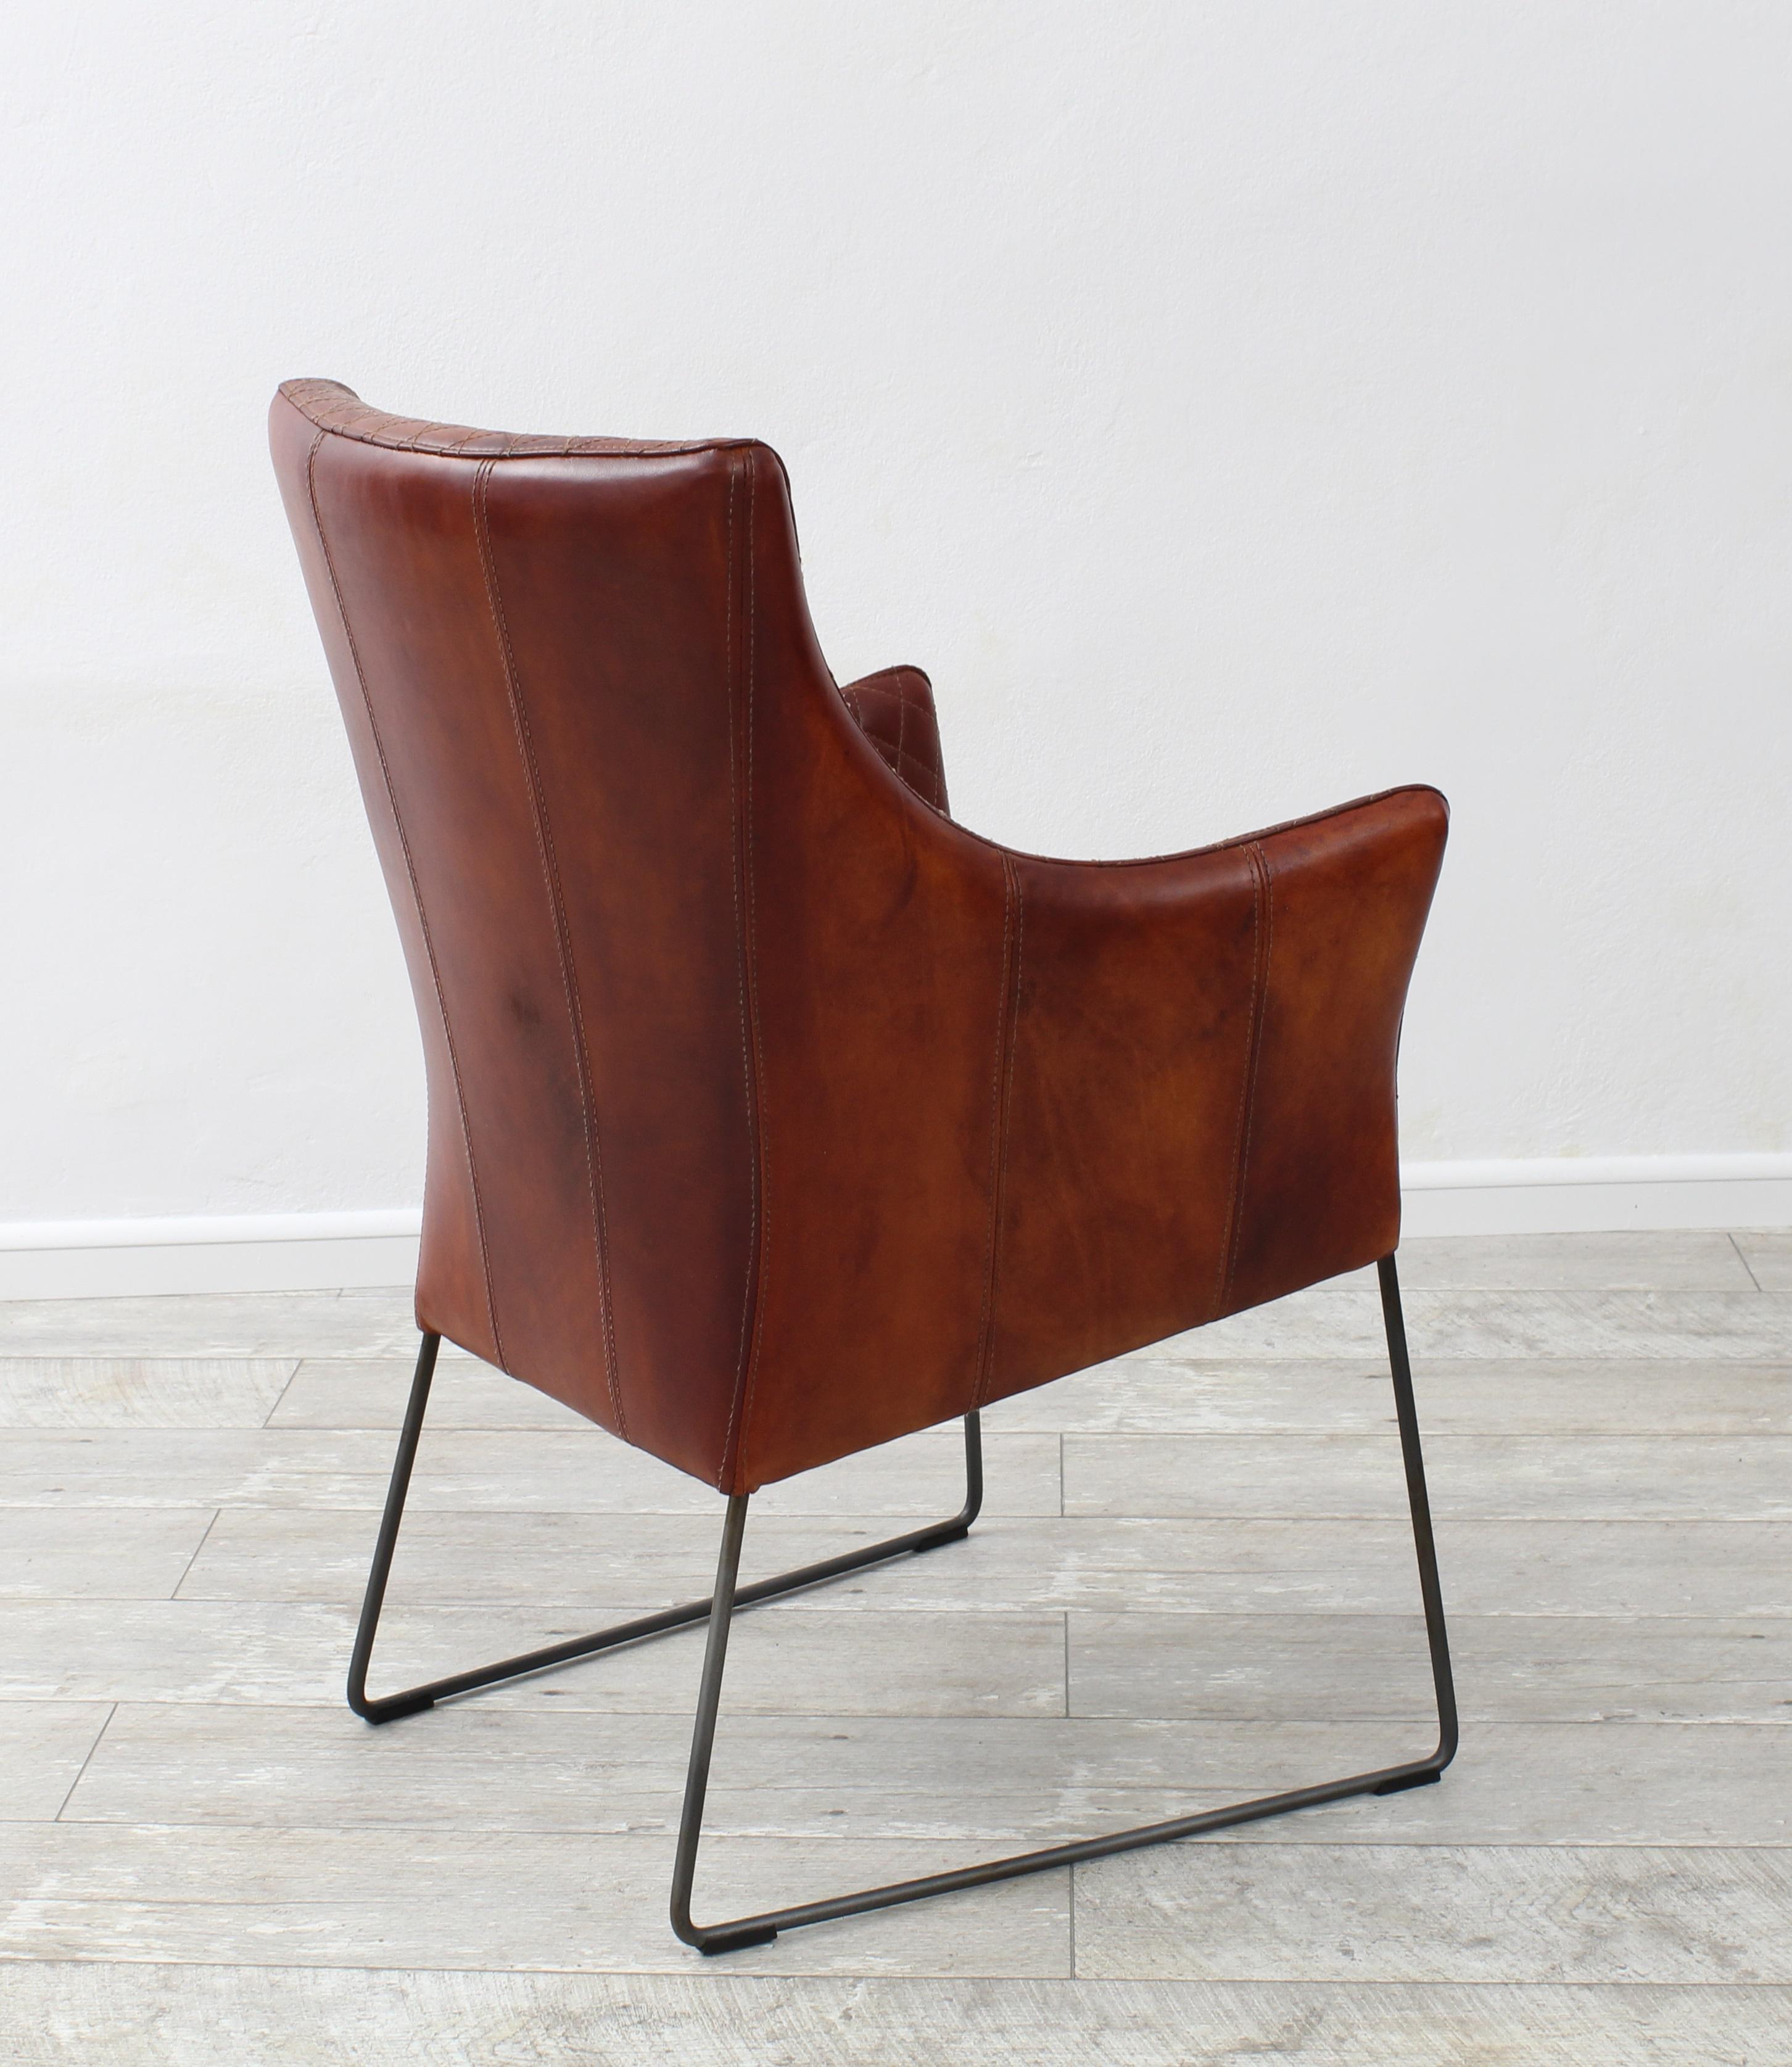 Aktiv stuhl sessel designer frankfurt echt for Designermobel frankfurt